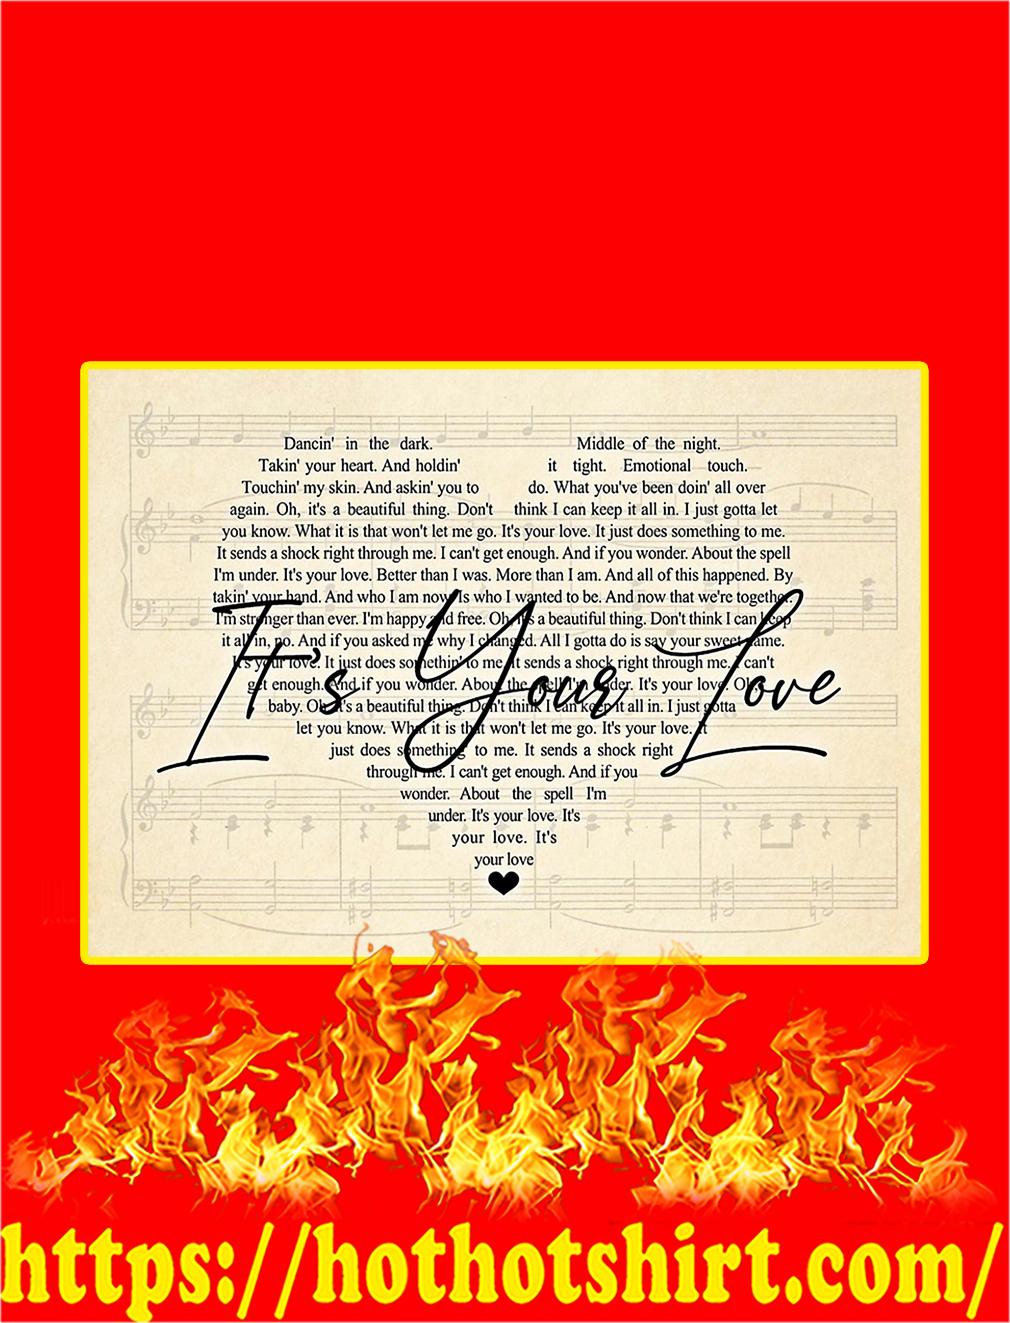 It's Your Love Lyrics Poster - A4